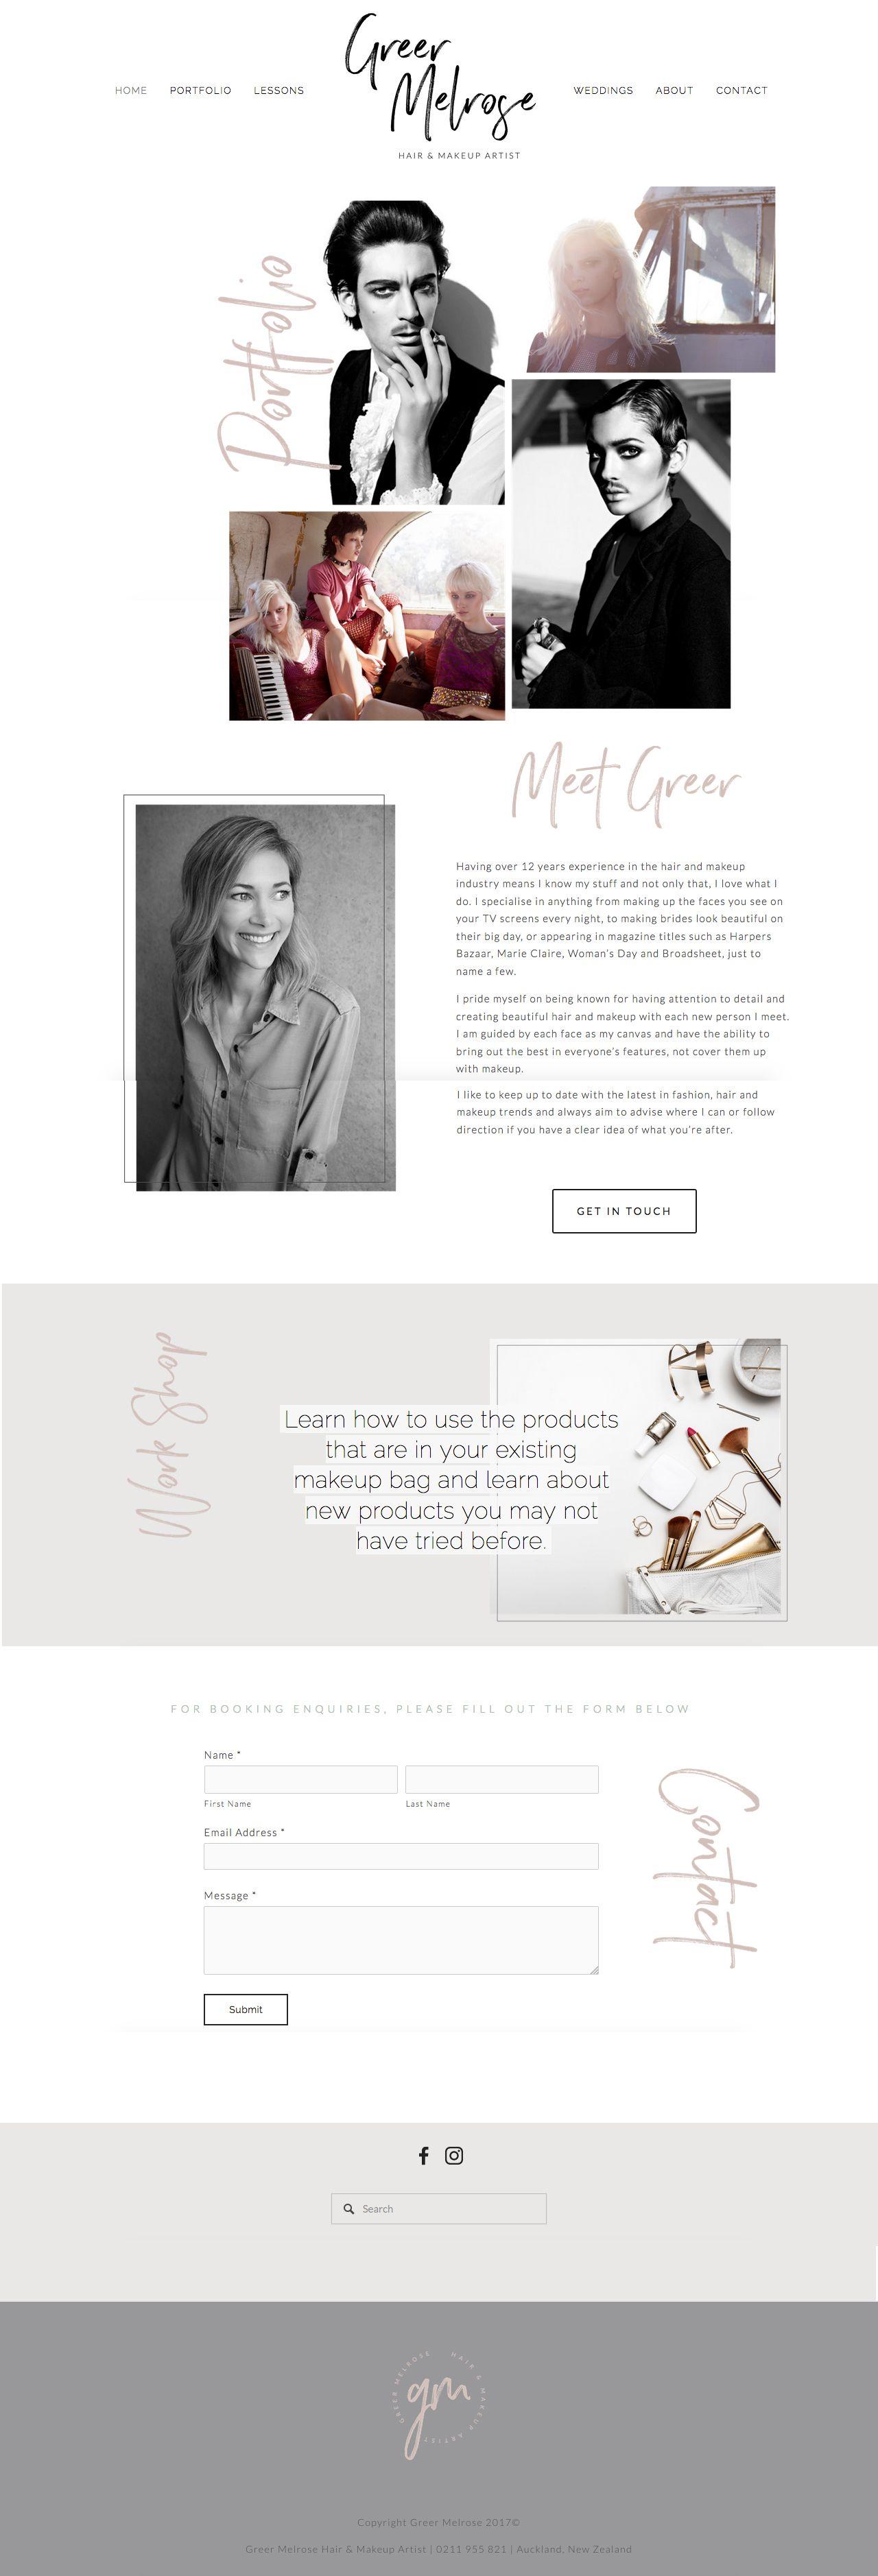 makeup artist cover letters%0A Squarespace webdesign by Polka Dot Heart Design   Makeup Artist Portfolio  Website   Branding  Brand